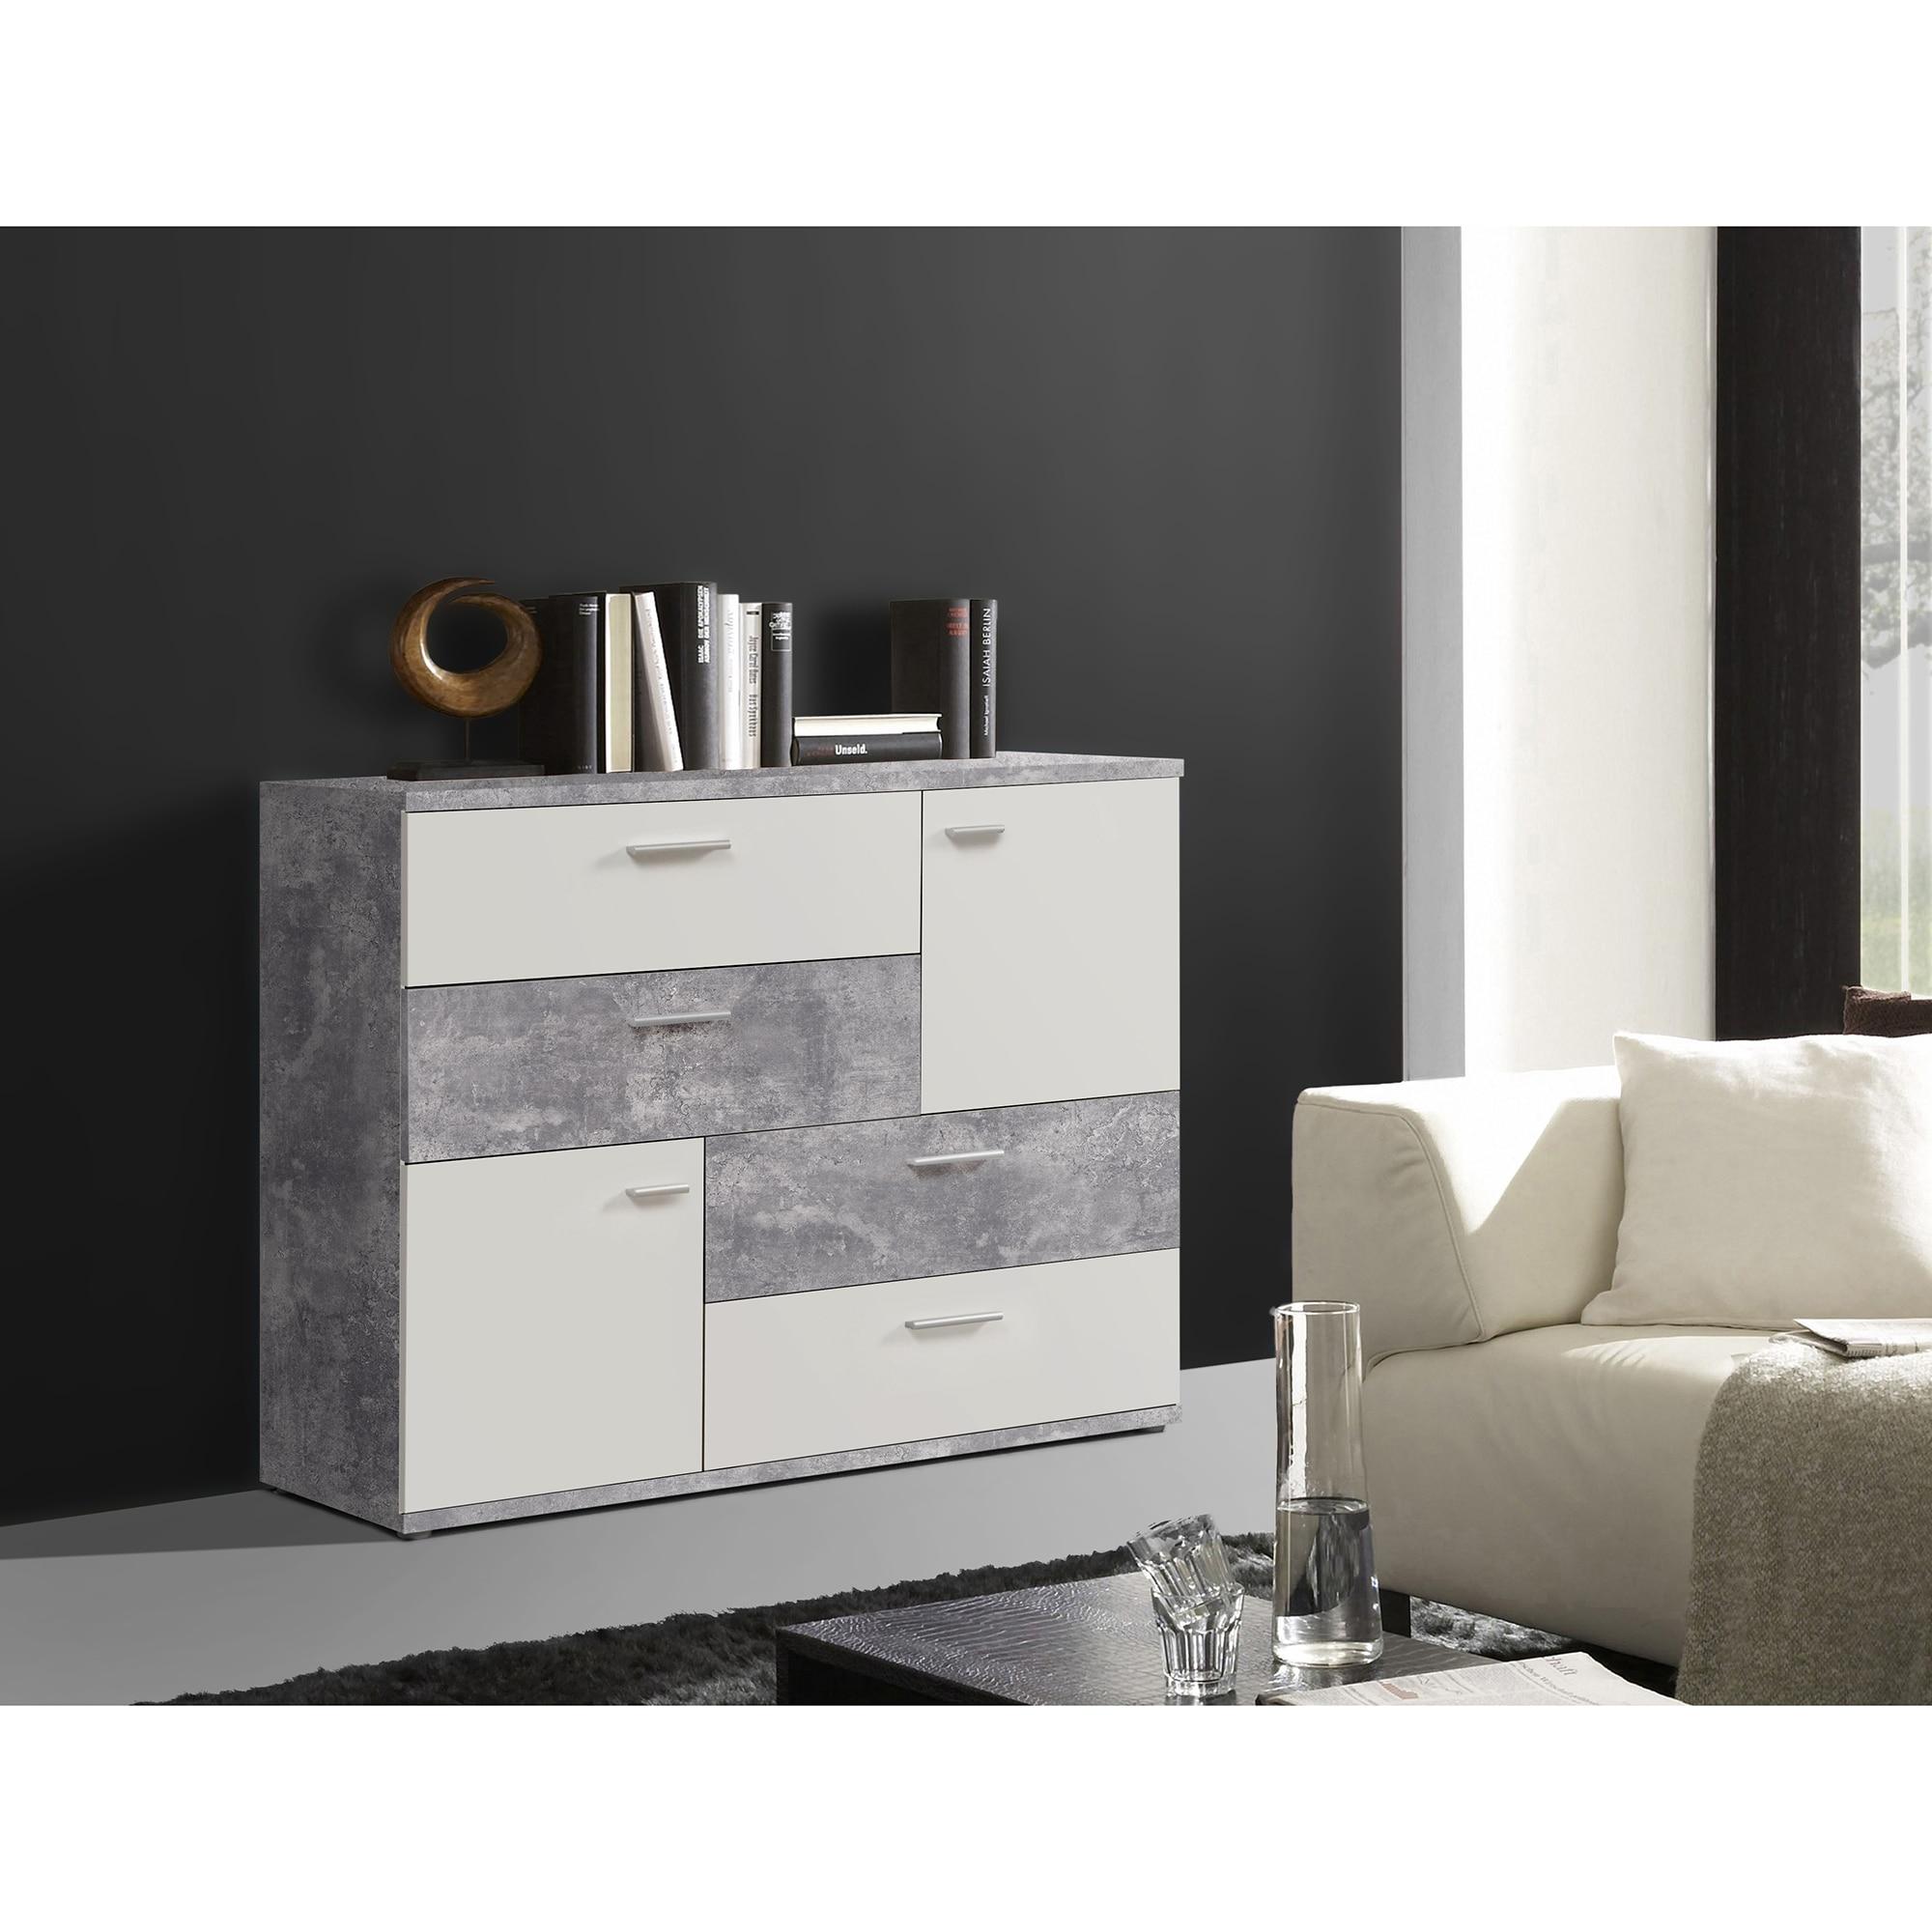 Fotografie Comoda Kring Tetris, 125x96x41.3 cm, culoare alb/optica beton, 4 sertare 2 usi